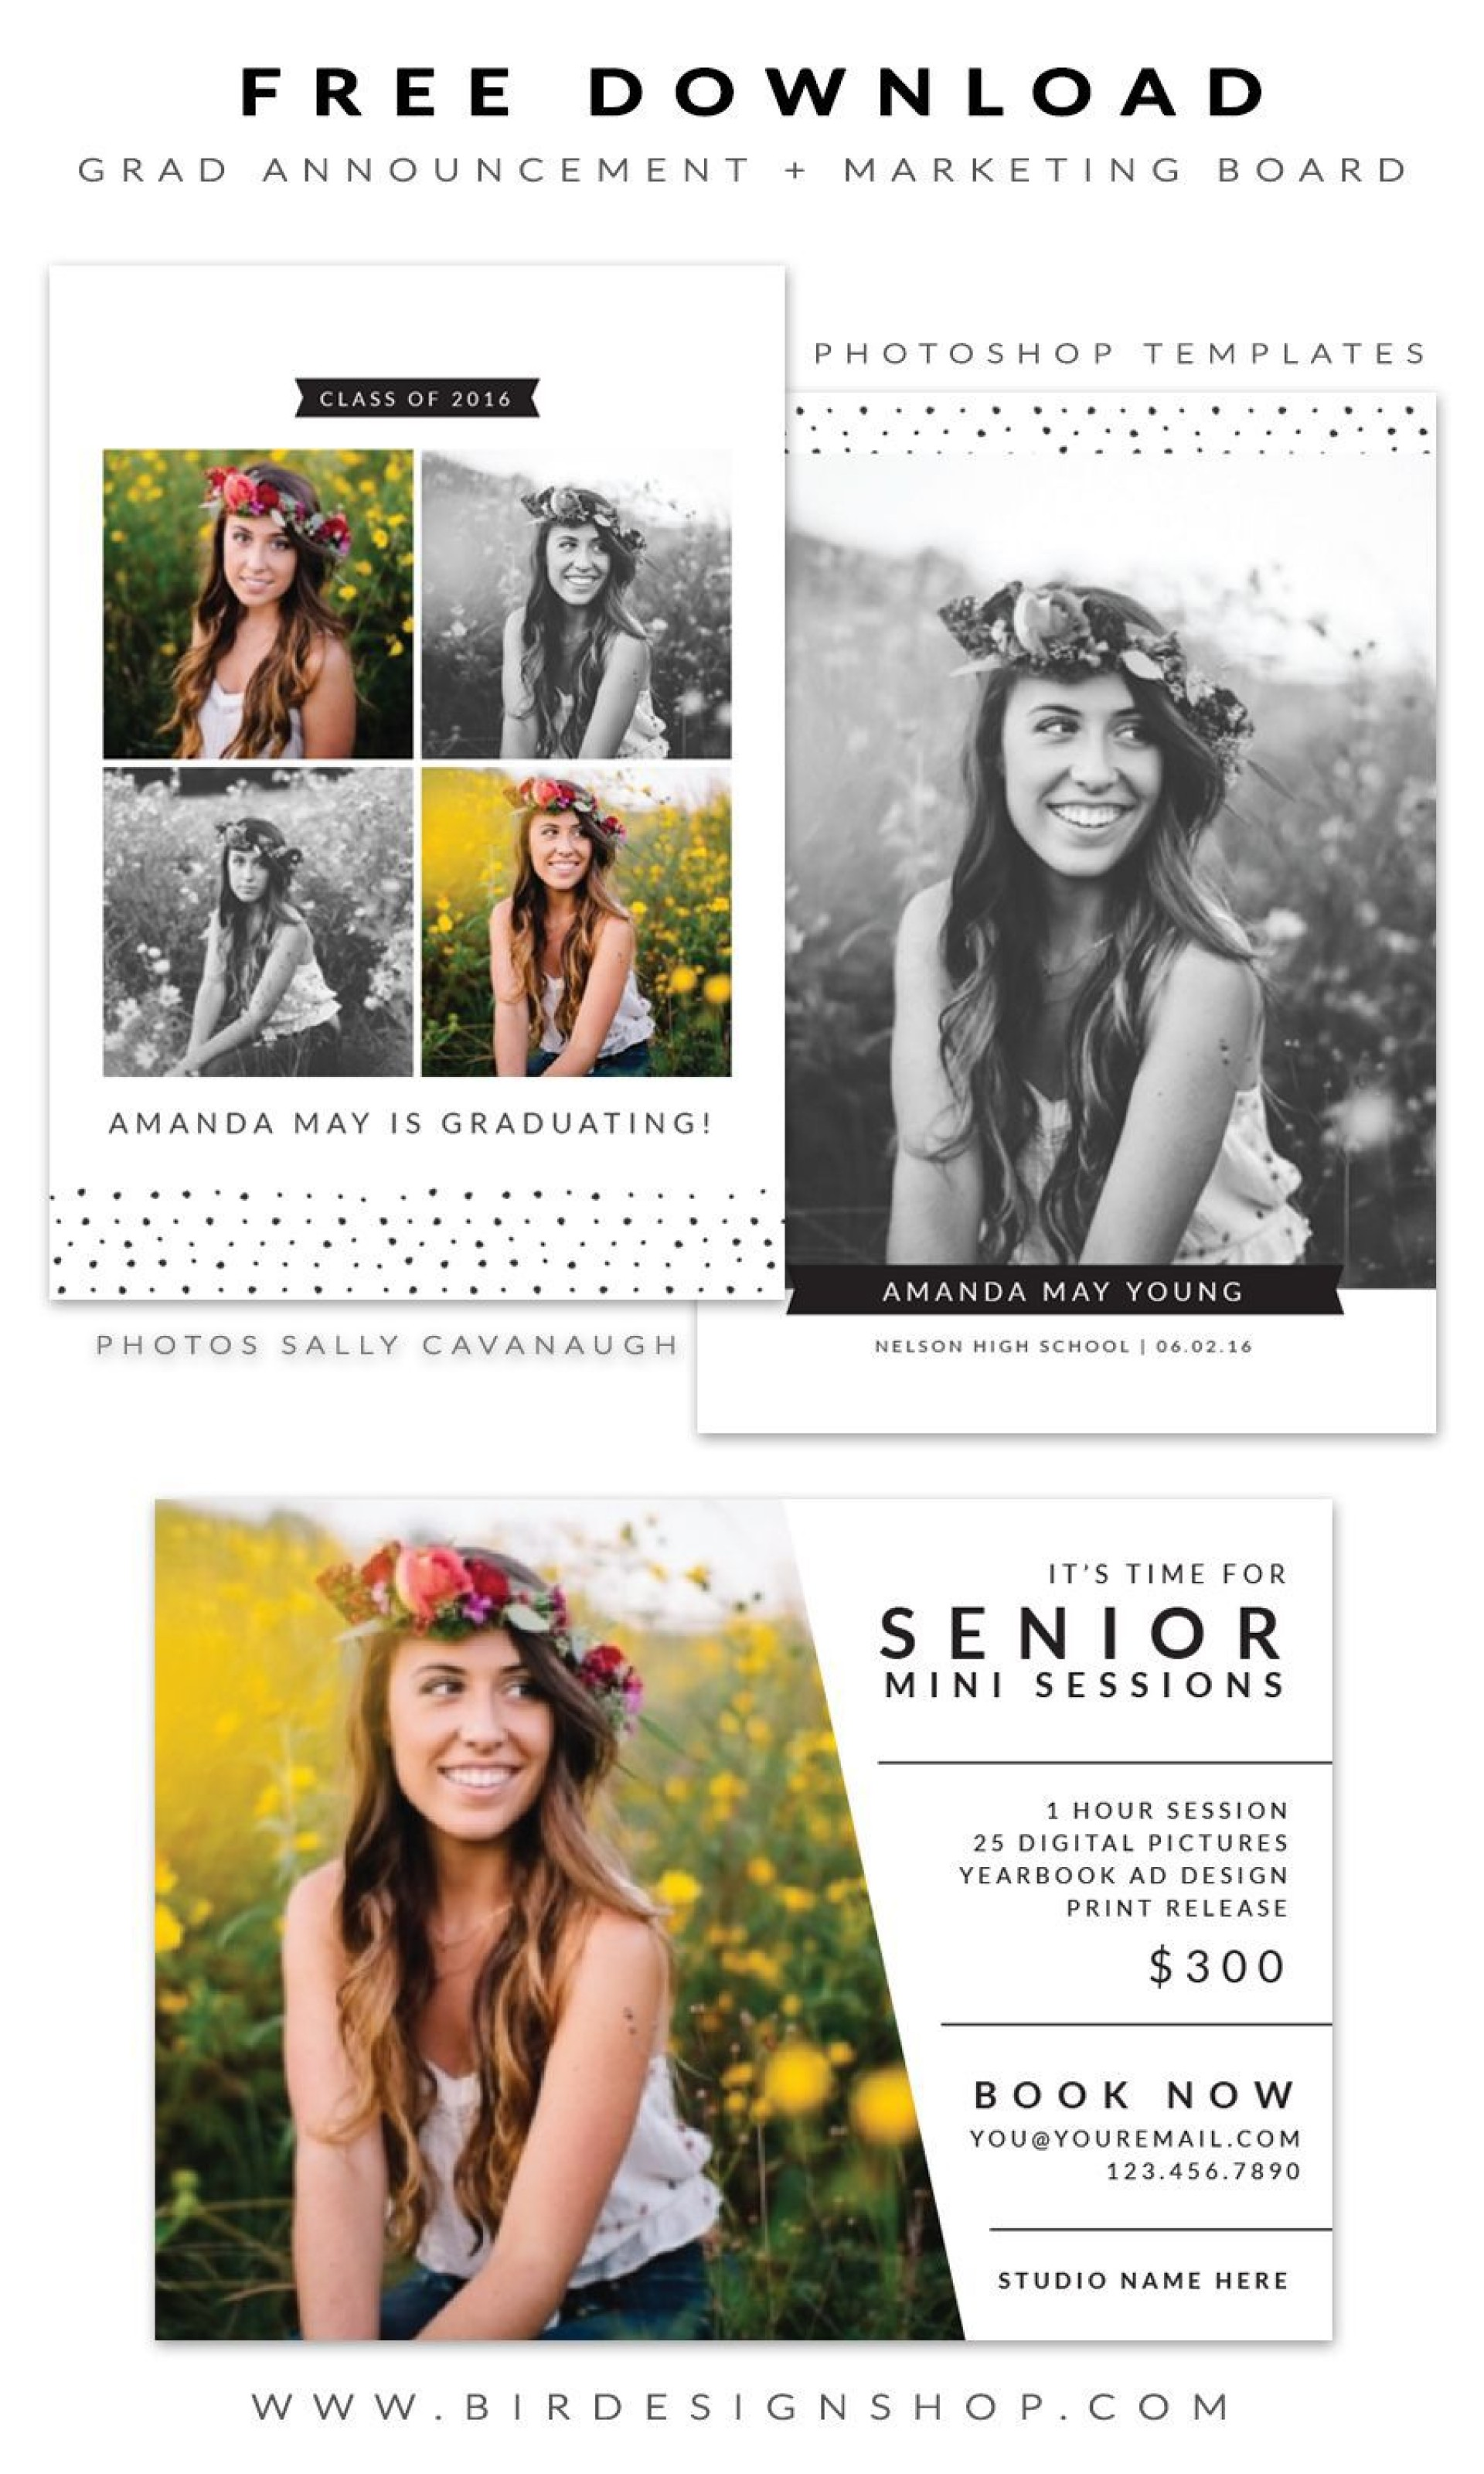 004 Wonderful Free Senior Template For Photoshop Idea  Collage1920